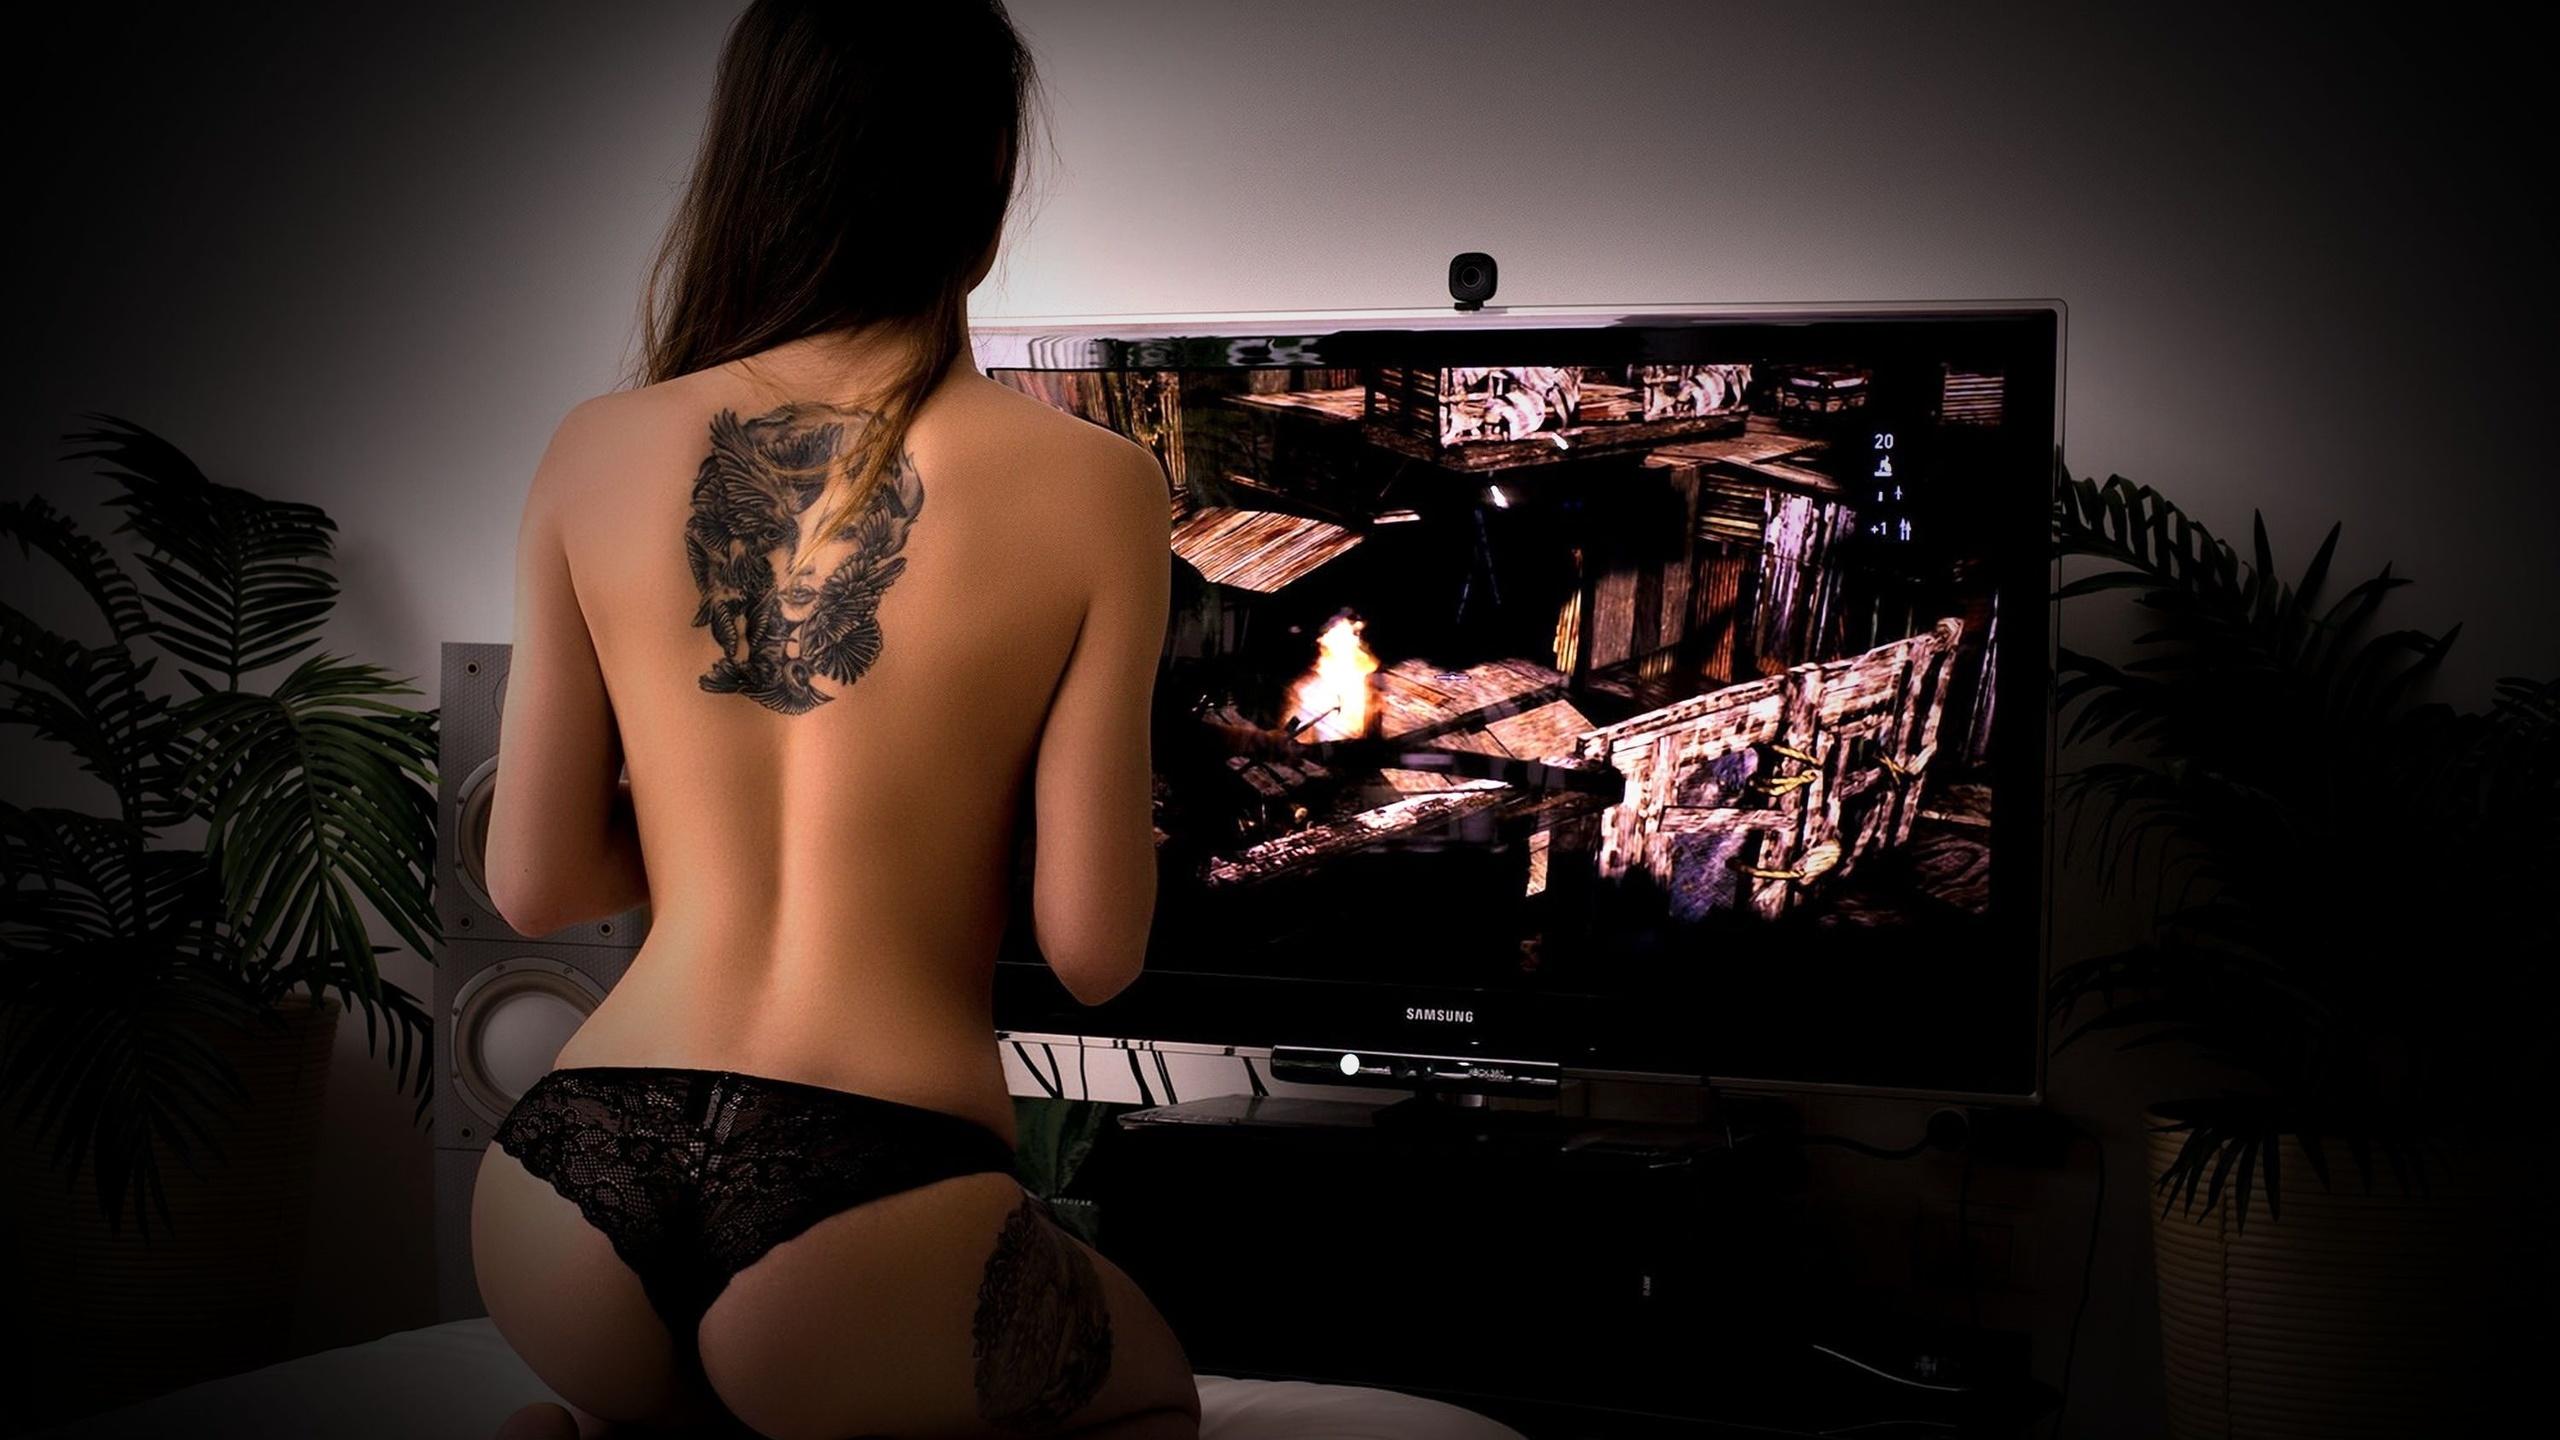 Sexy hot gamer girl cosplay